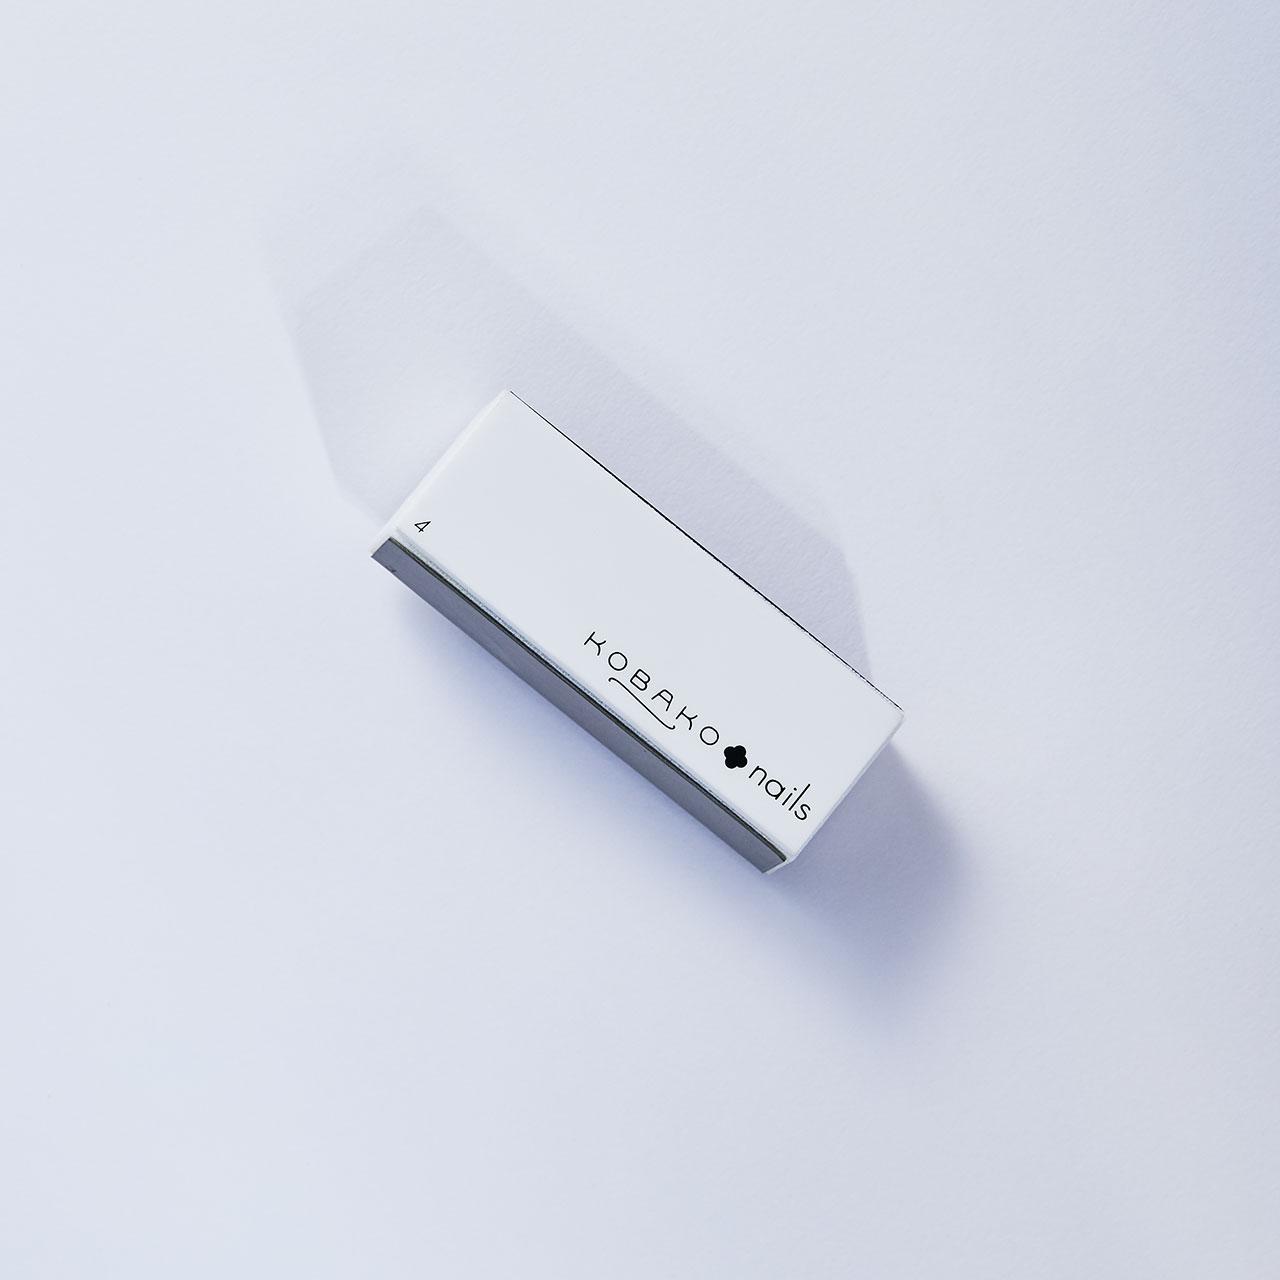 KOBAKO ブロックバッファー (2個入) ¥1,200